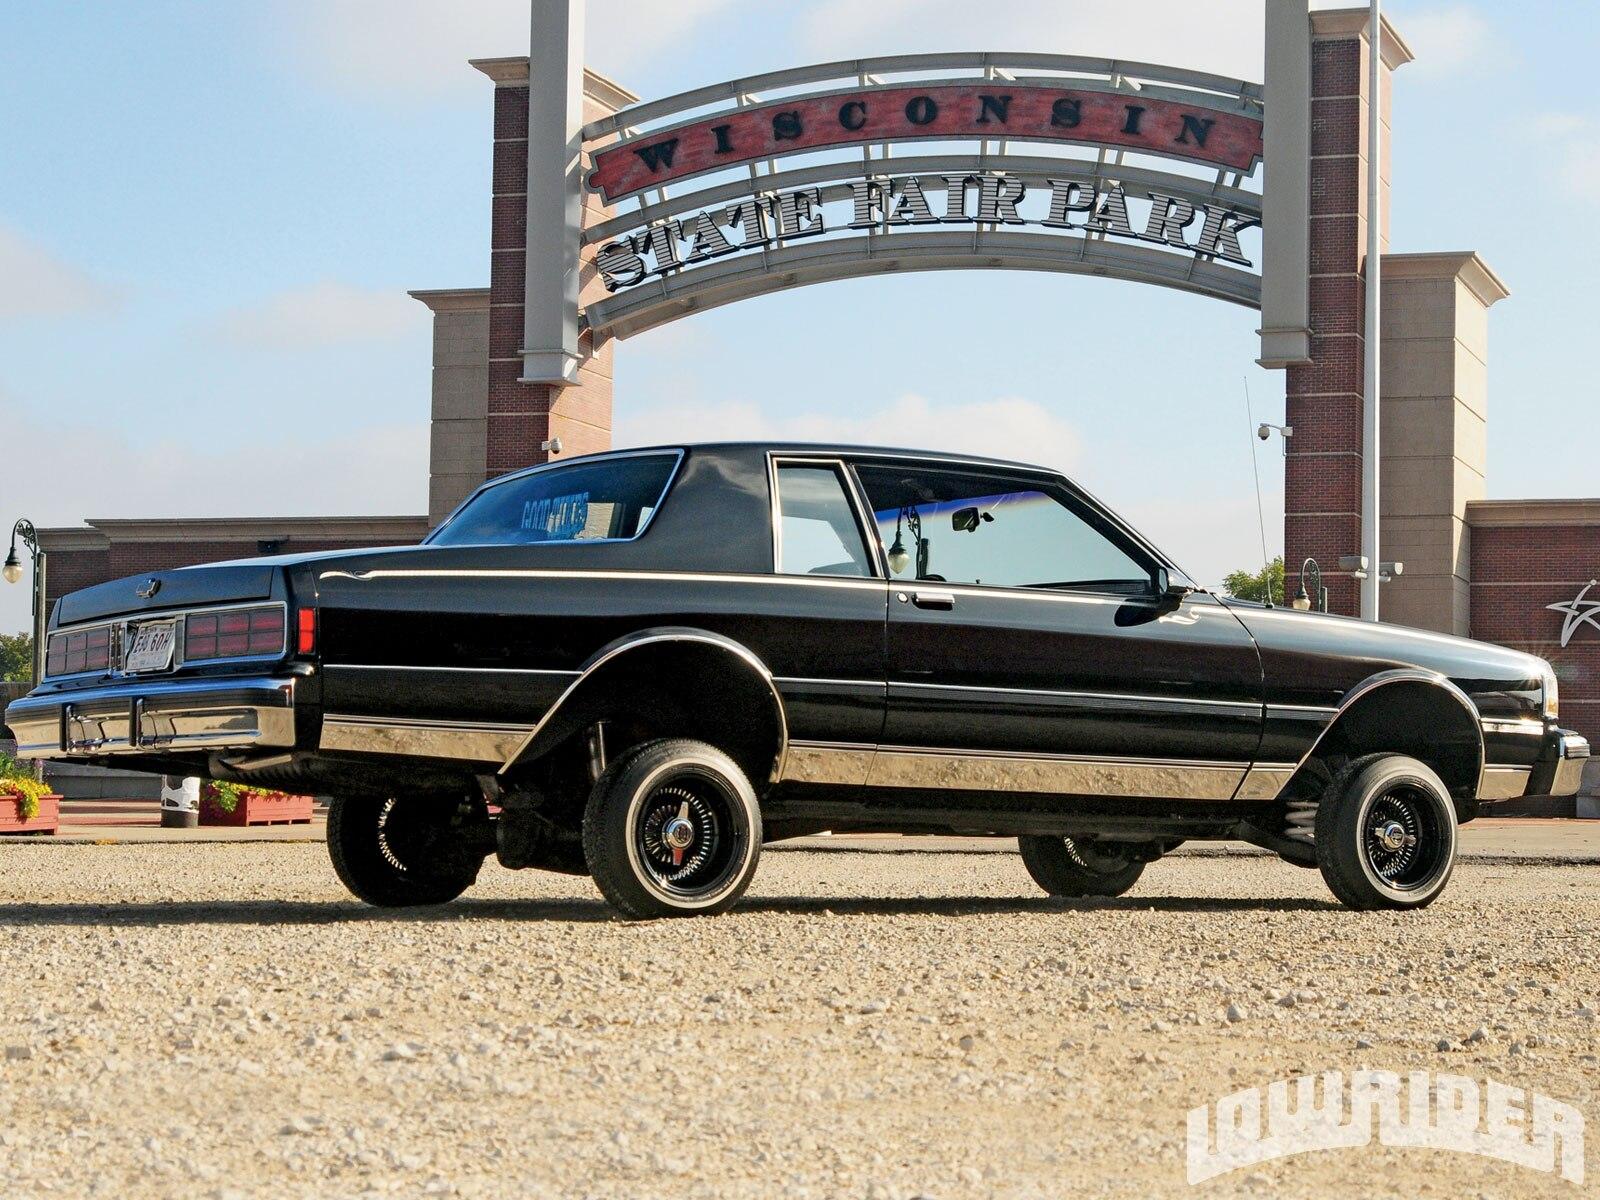 1987 Chevrolet Caprice - Lowrider Magazine